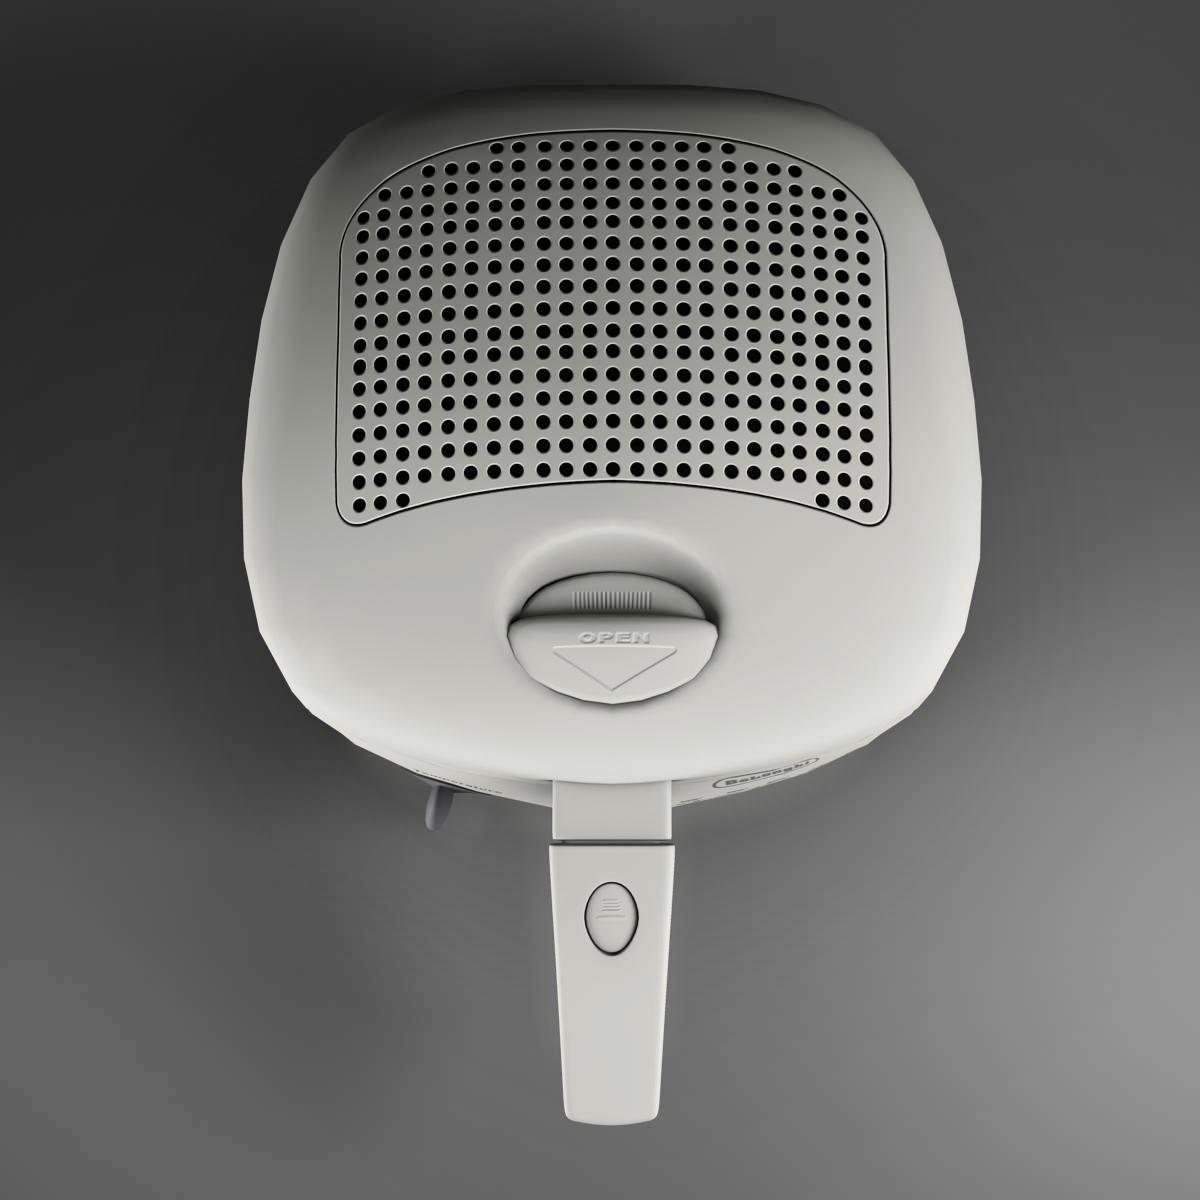 frying pan low poly 3d model 3ds max fbx ma mb obj 158934